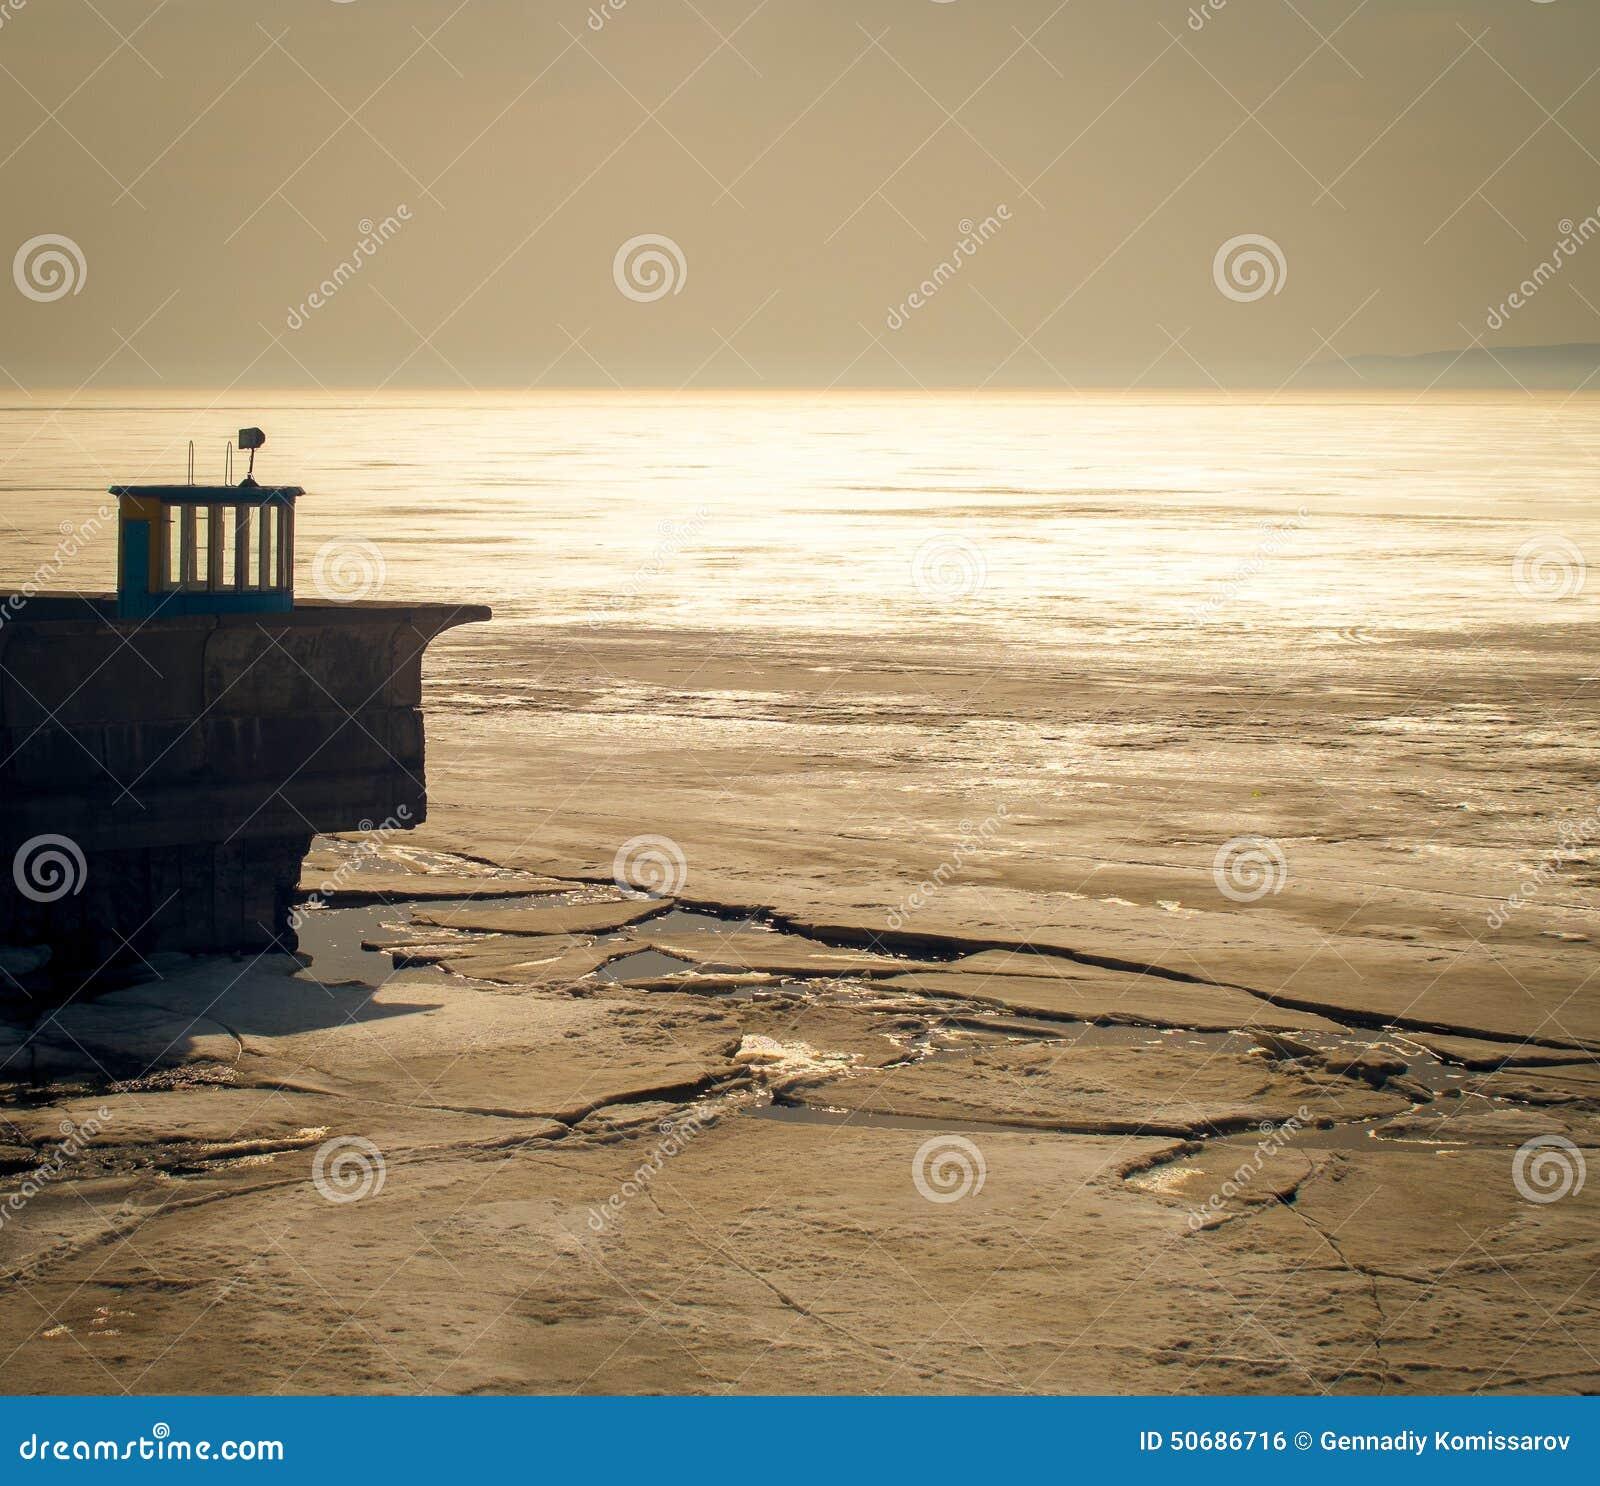 Download 春天剧情 库存照片. 图片 包括有 照明设备, 云彩, 海岛, 小船, 反映, 春天, 心情, 沈默, 结构树 - 50686716